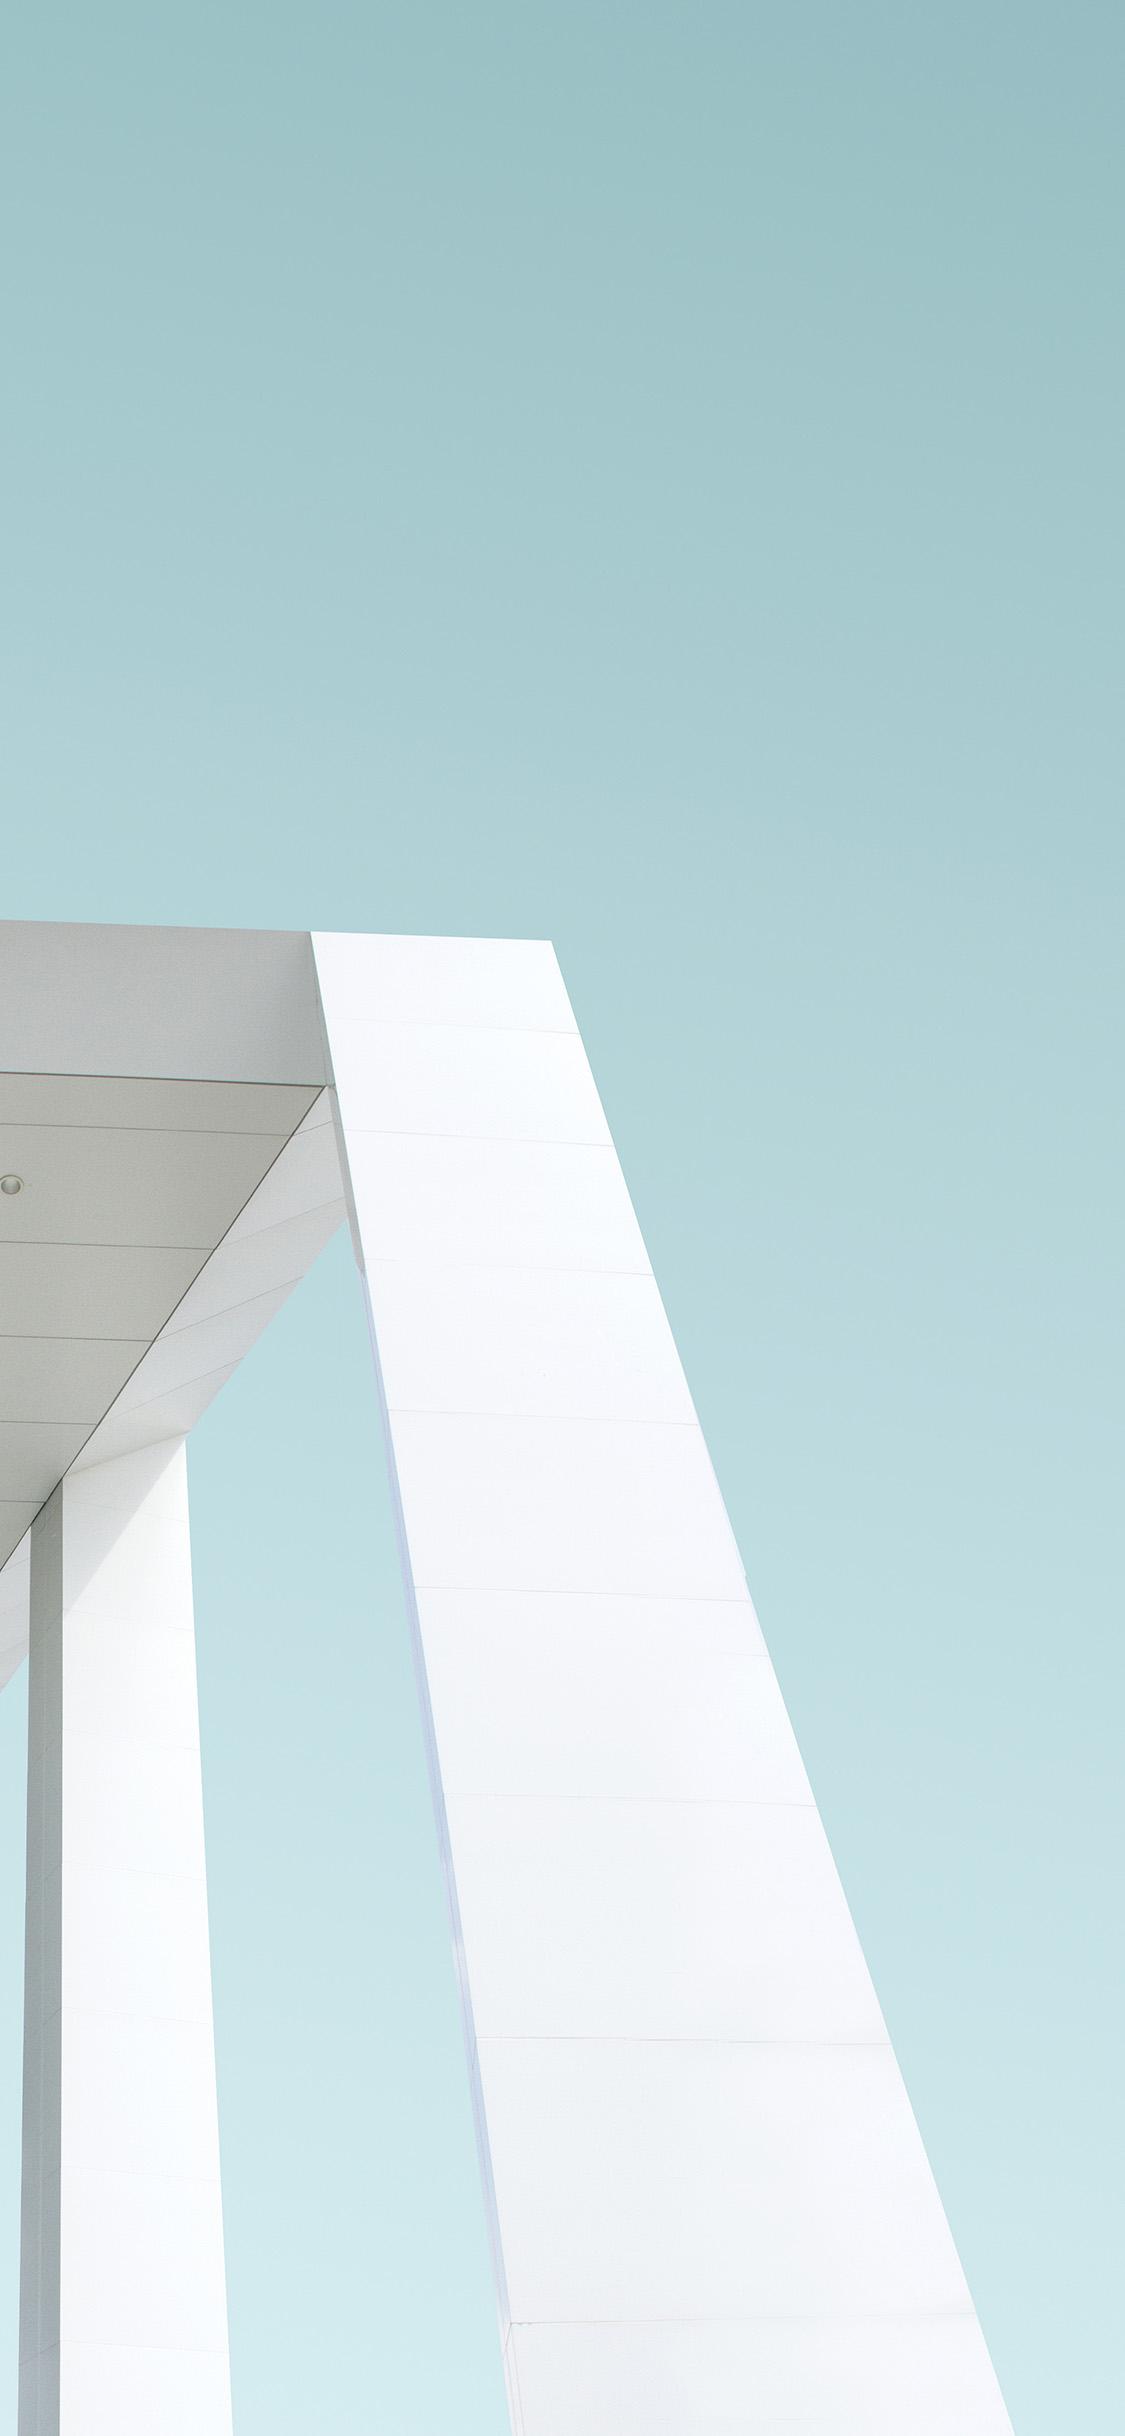 Iphonexpapers Com Iphone X Wallpaper Vx94 Simple Architecture